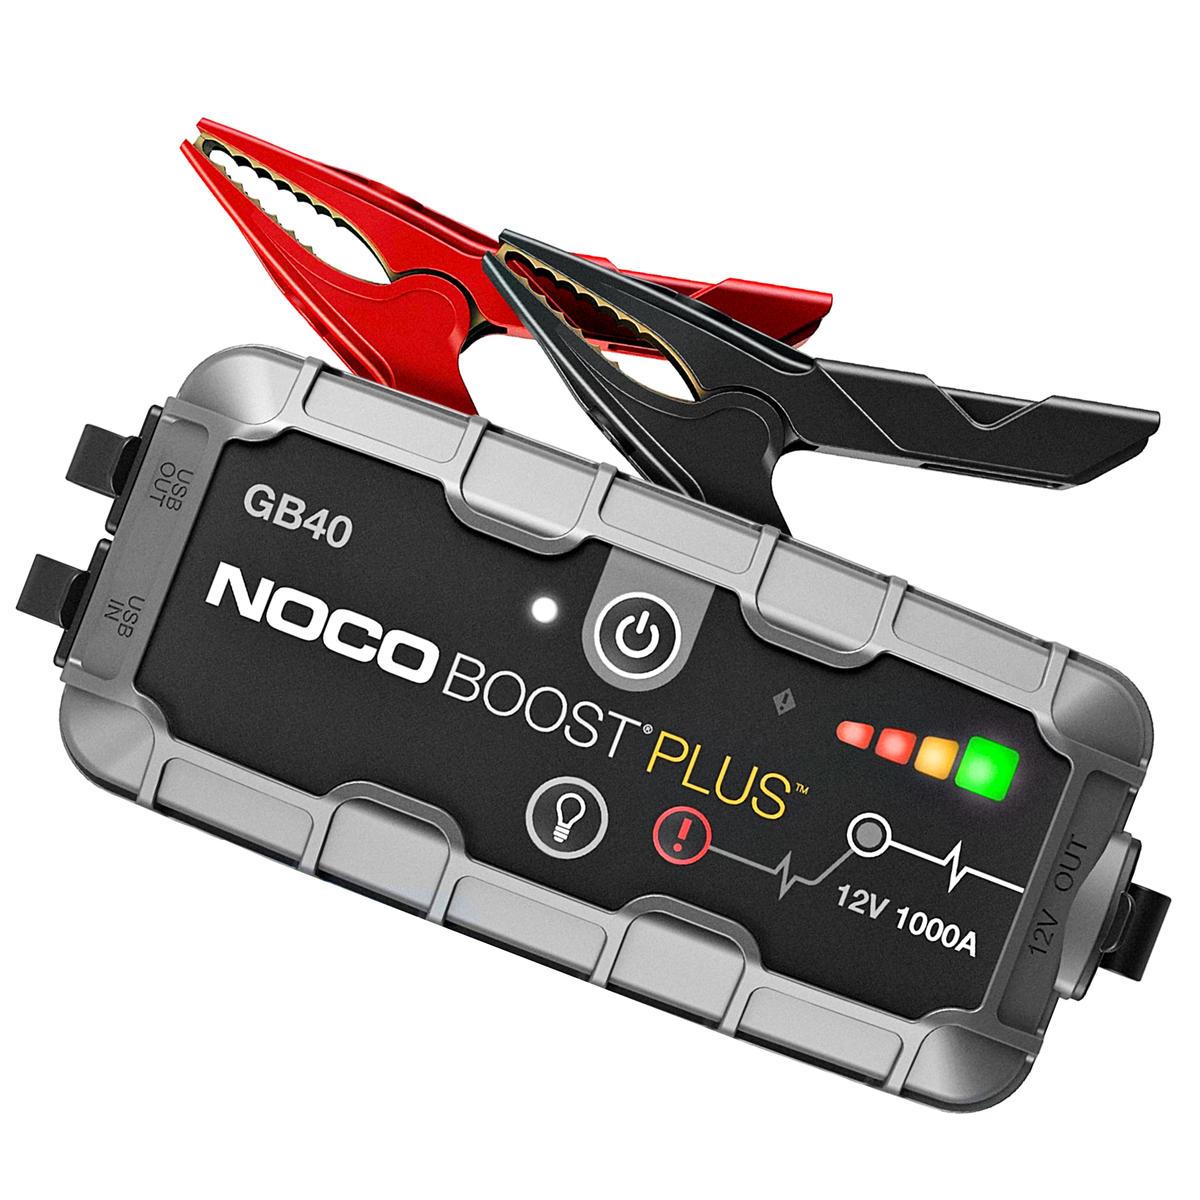 Noco Genius GB40 1000A 12v 6L 3L Petrol Diesel Jump Starter Booster Battery Pack